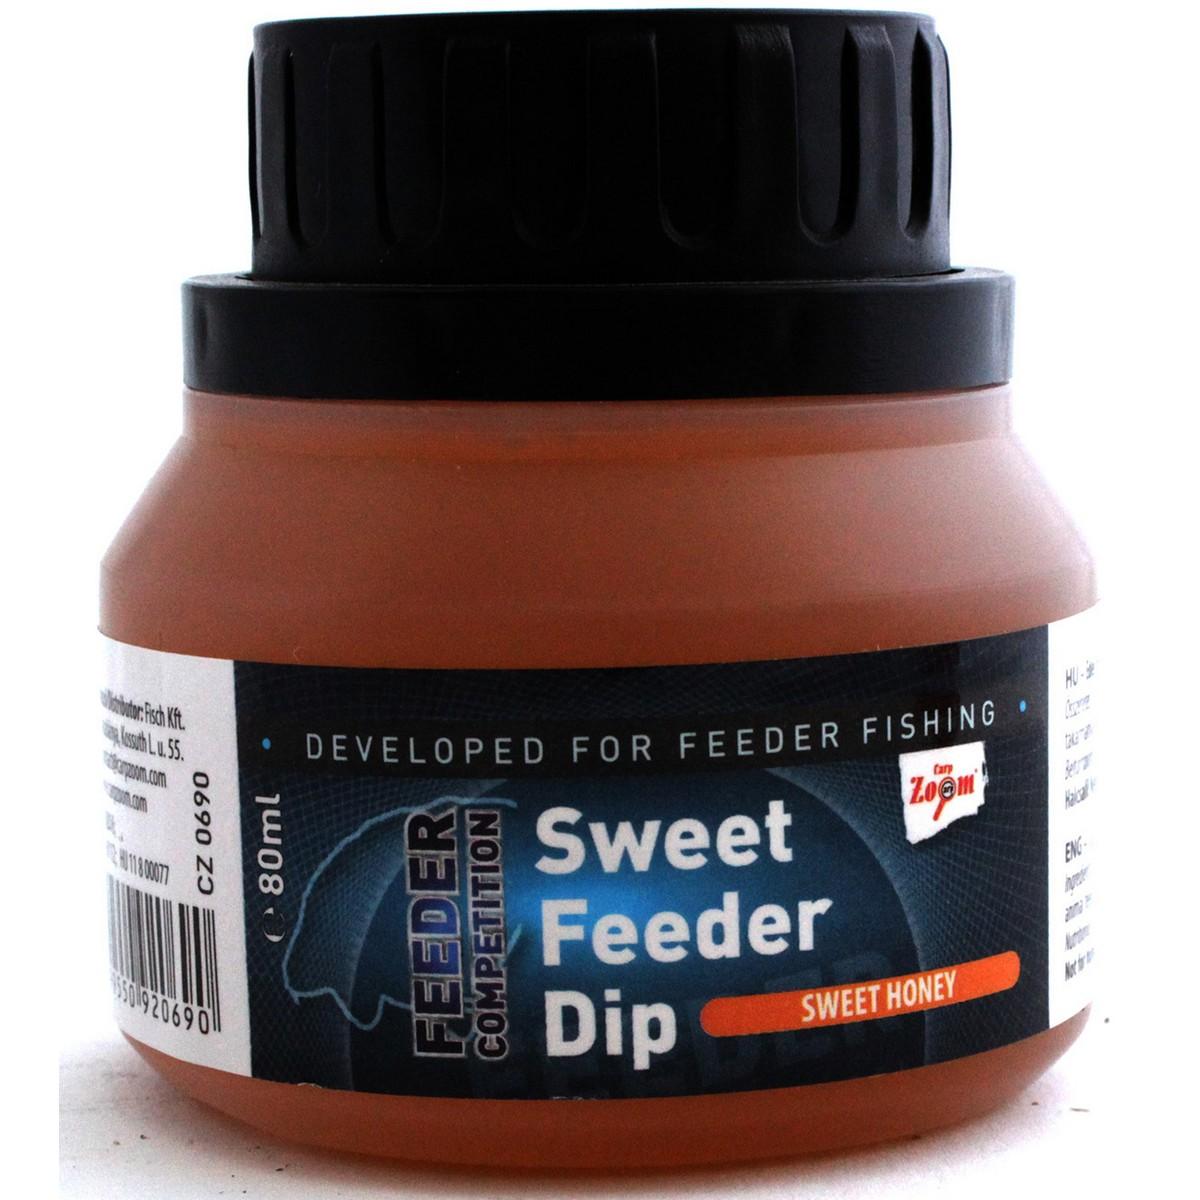 CZ FC Sweet Feeder Dip honey